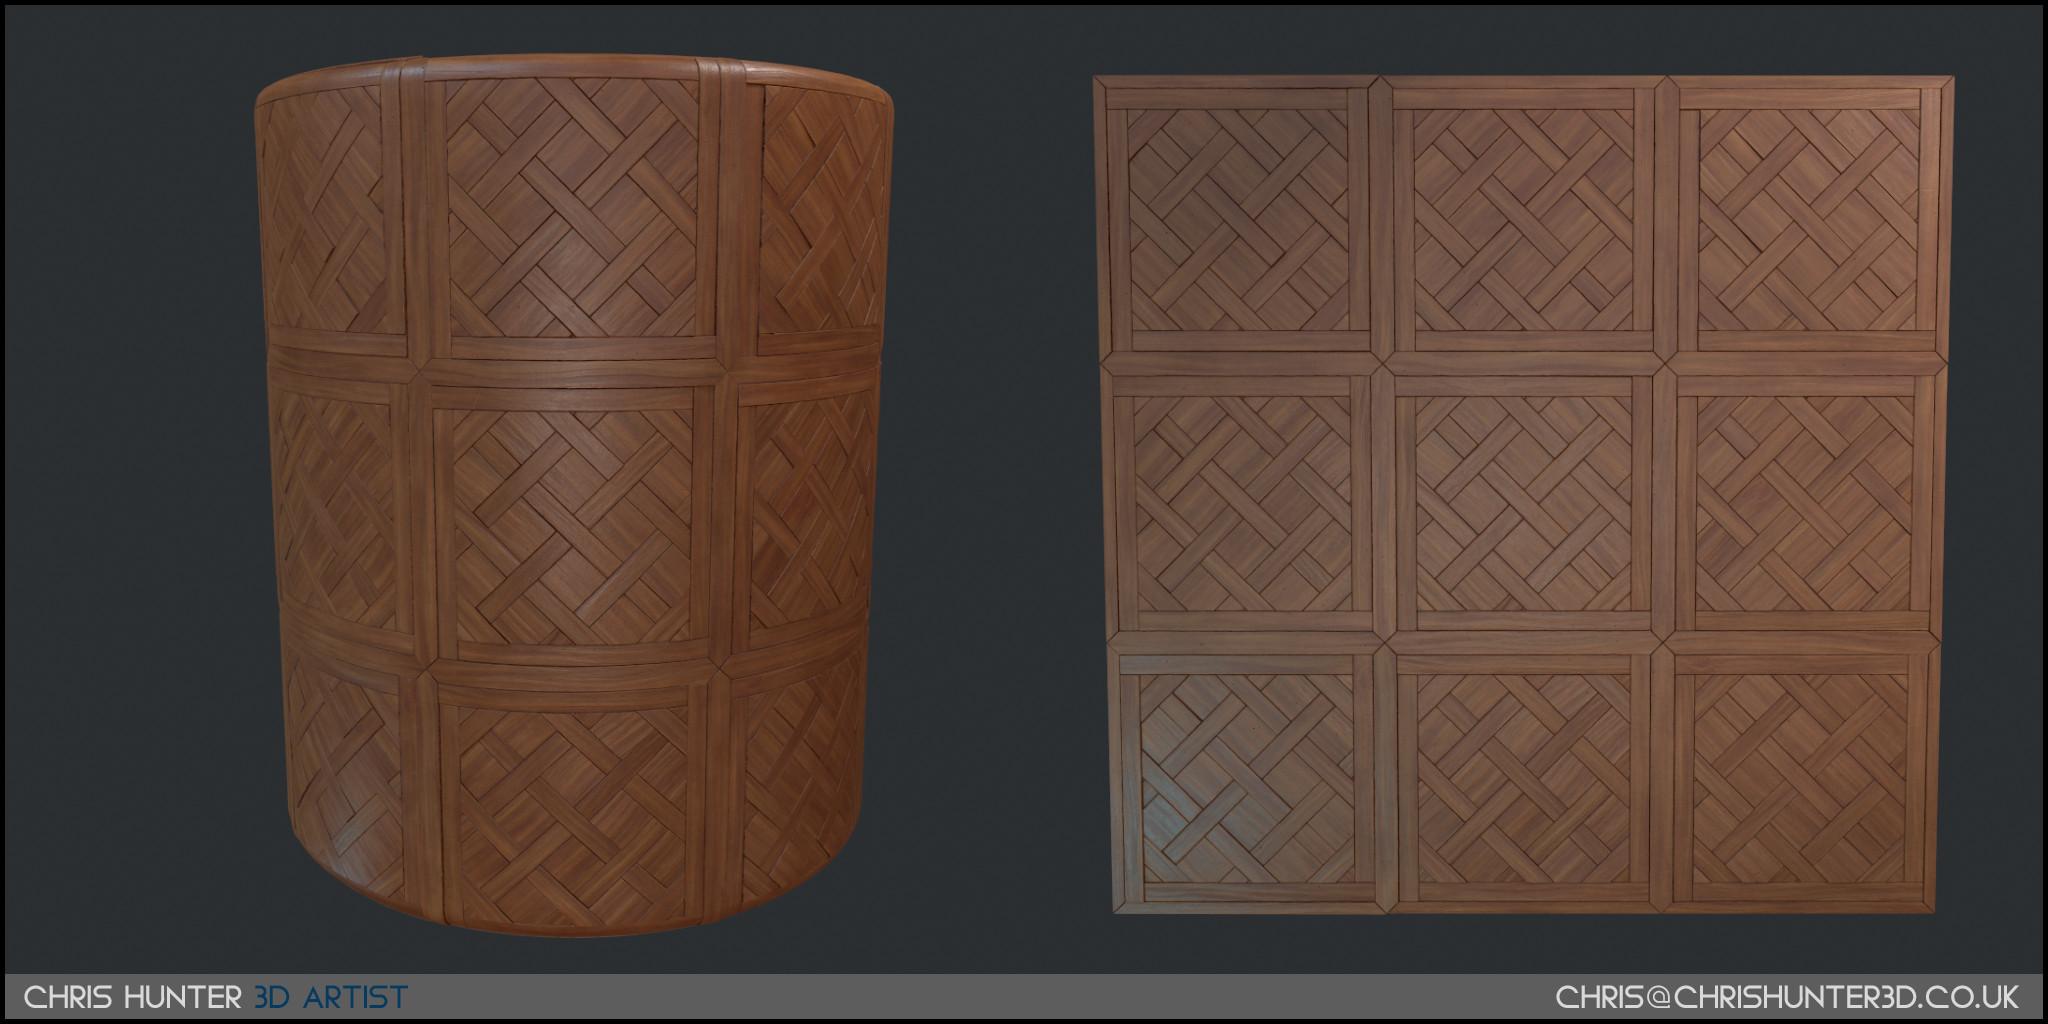 Wooden floor material made 100% in substance designer